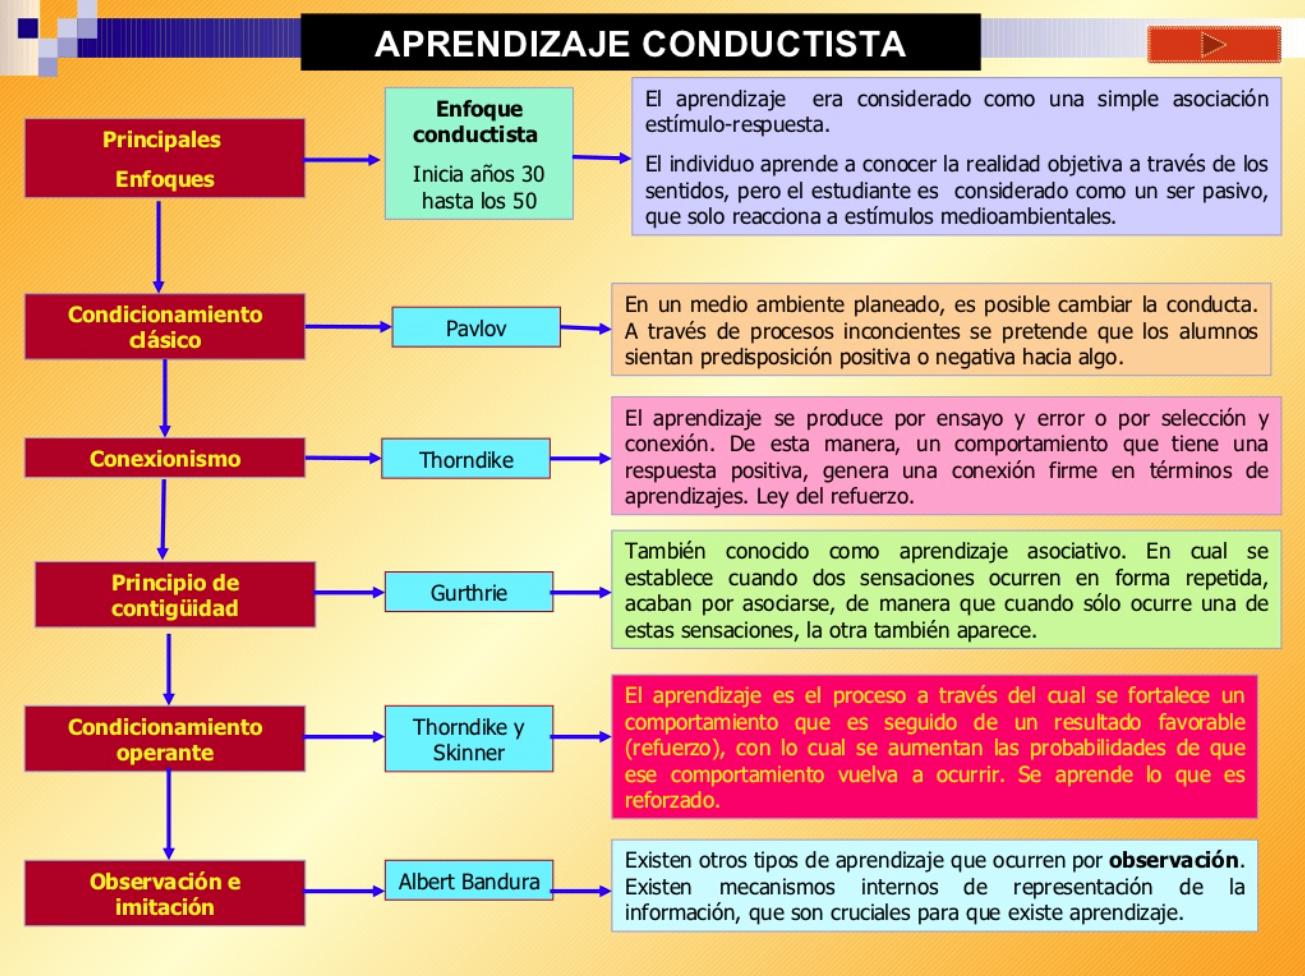 Teoria De Aprendizaje Conductista Teorias Del Aprendizaje Psicologia Del Aprendizaje Aprendizaje